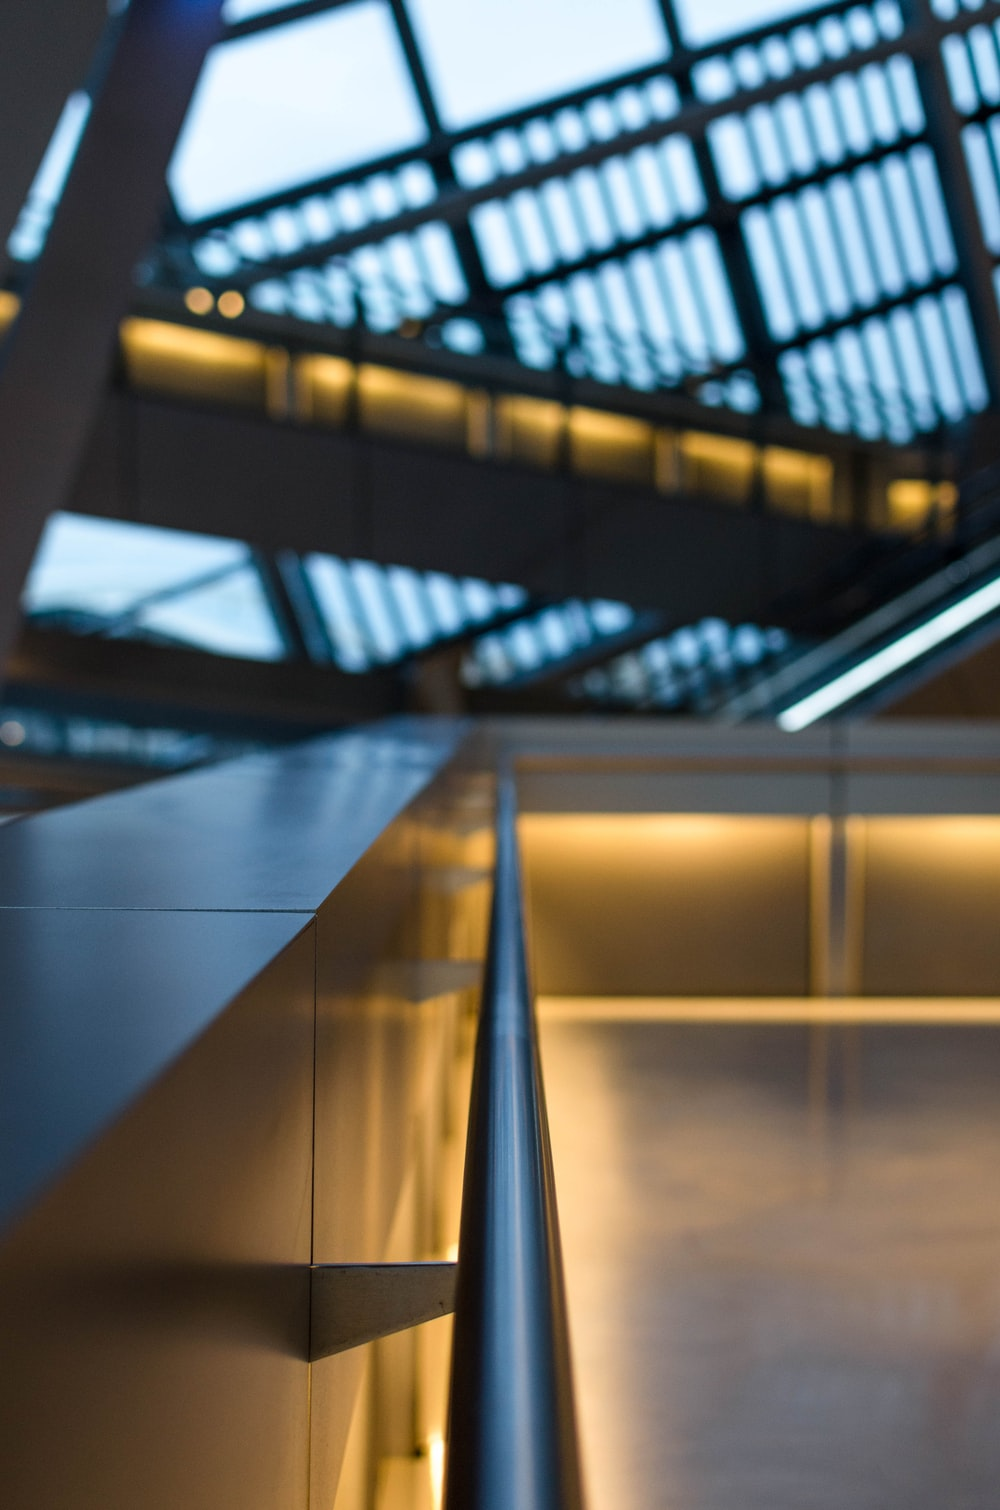 gray stainless steel railings inside building